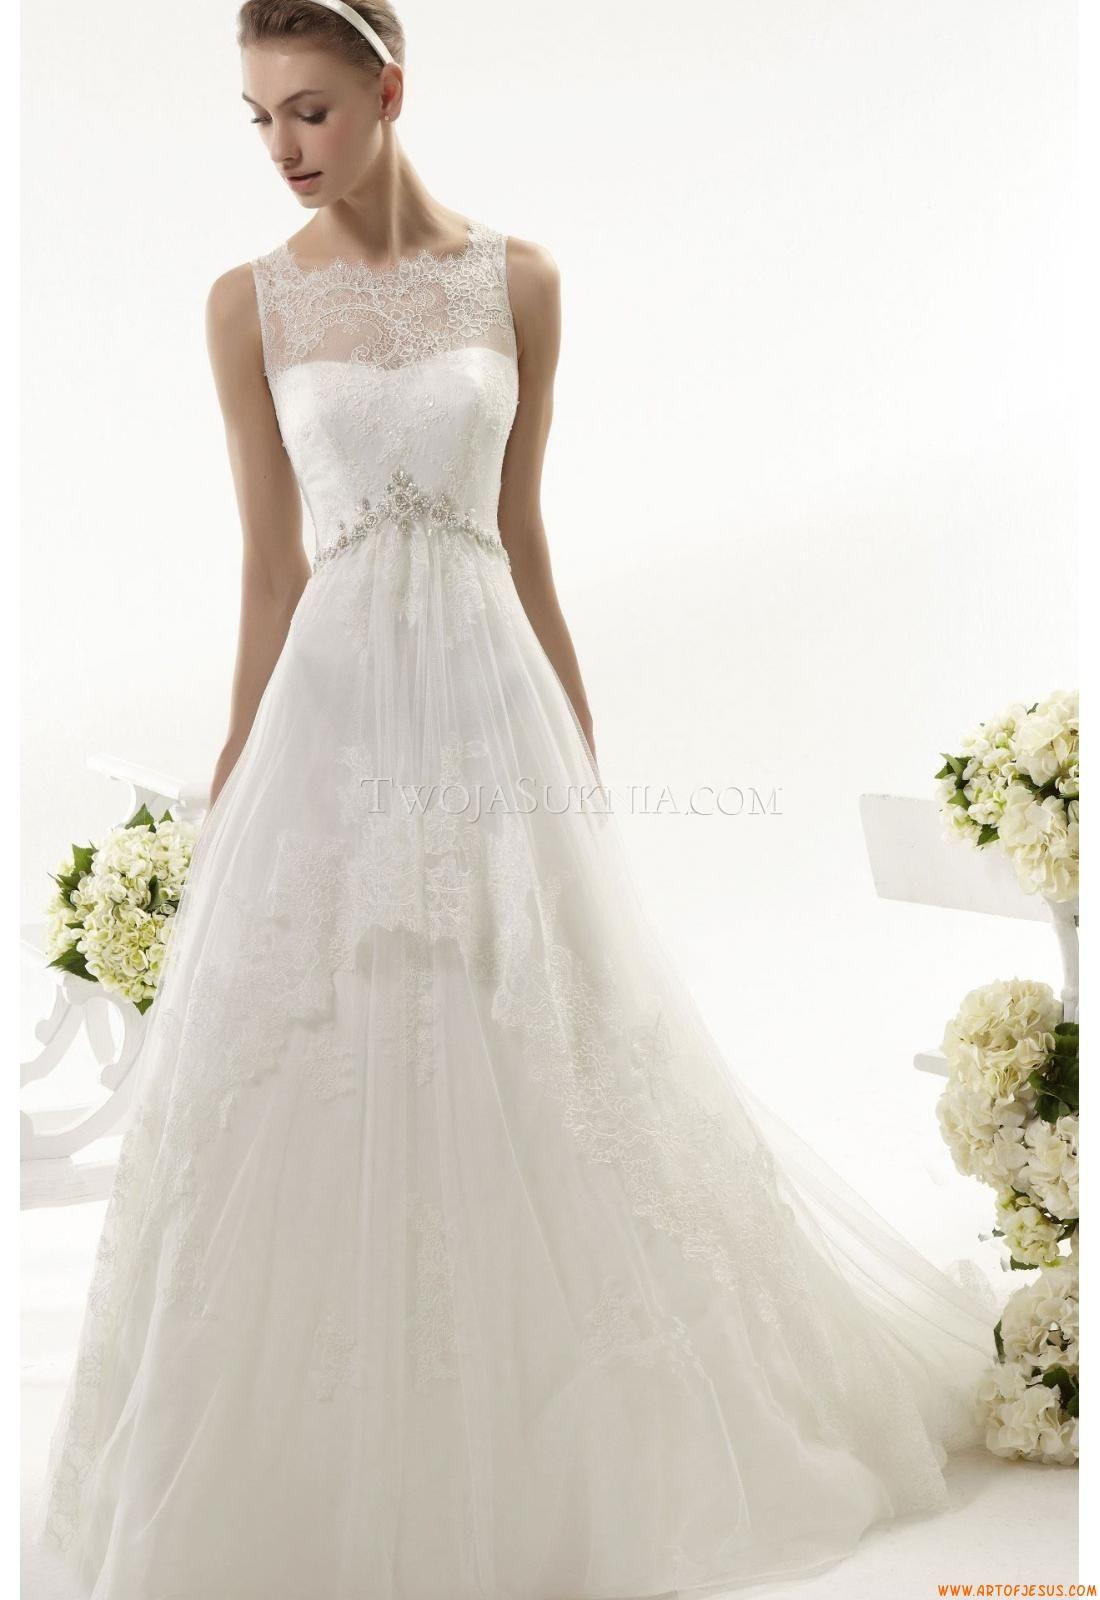 Aire barcelona wedding dresses  Wedding Dresses Aire Barcelona  Yauris Vintage   Not Getting